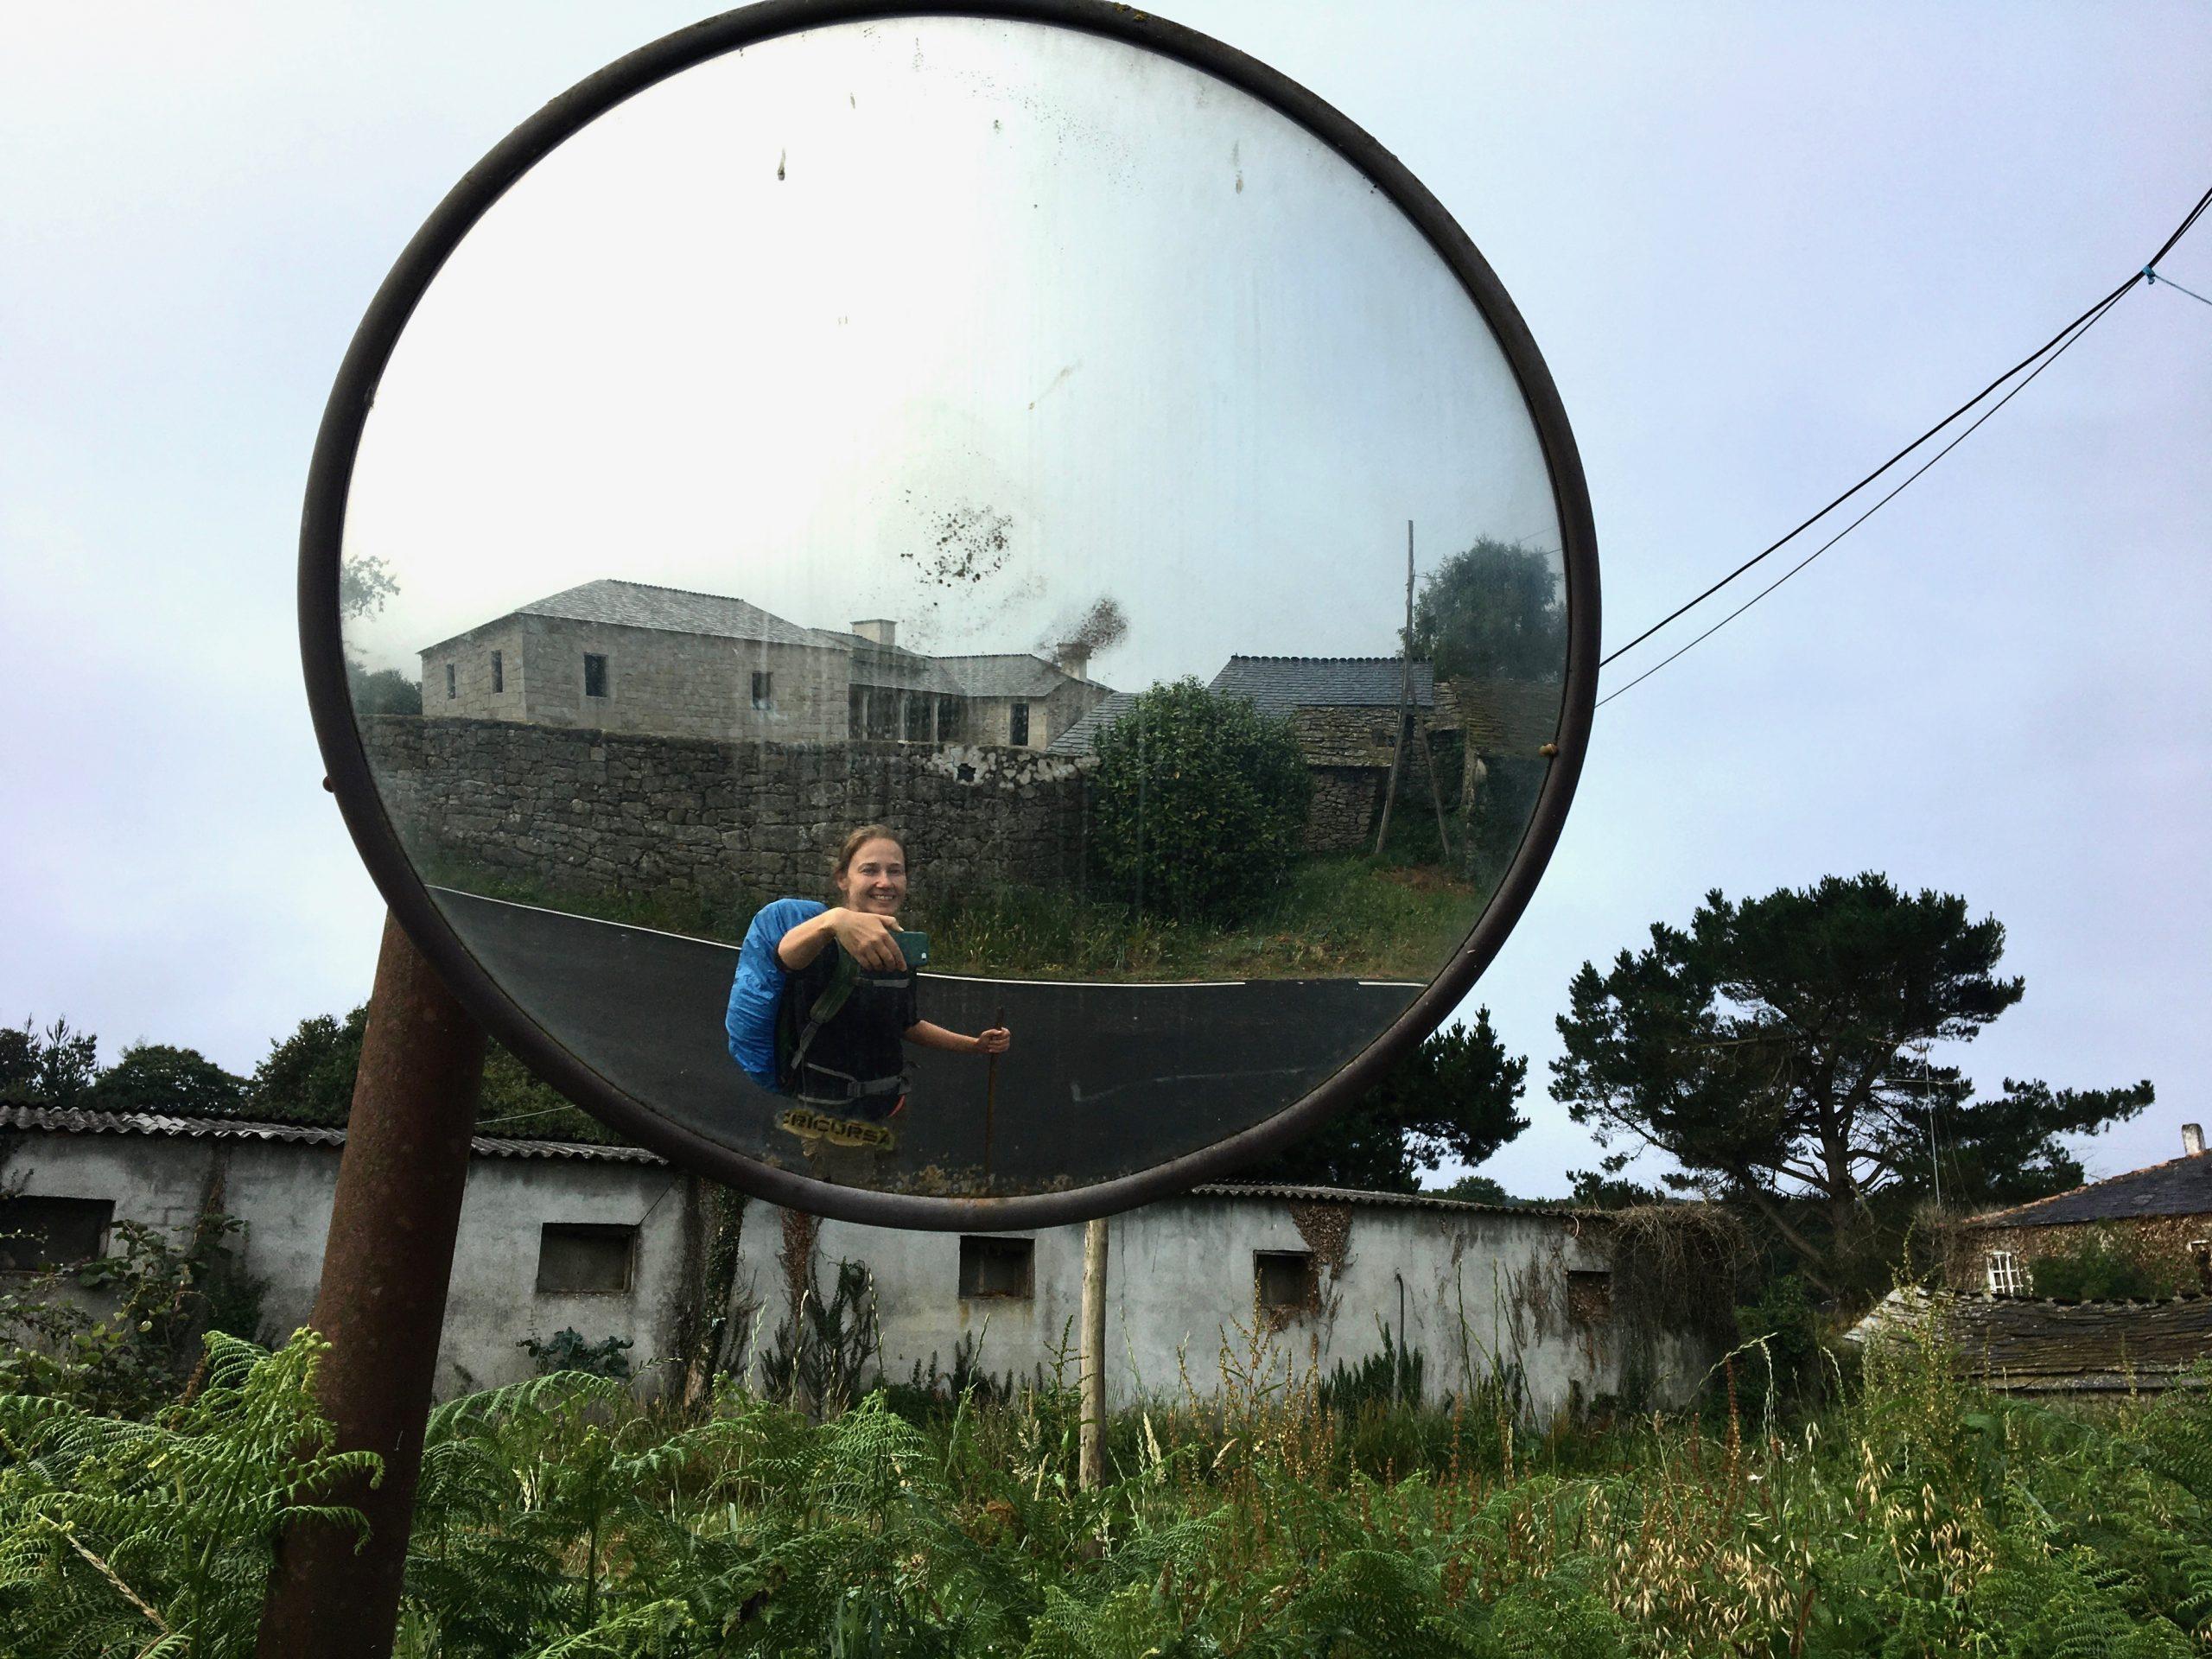 Selfie in mirror, Day 8 on the Camino Primitivo